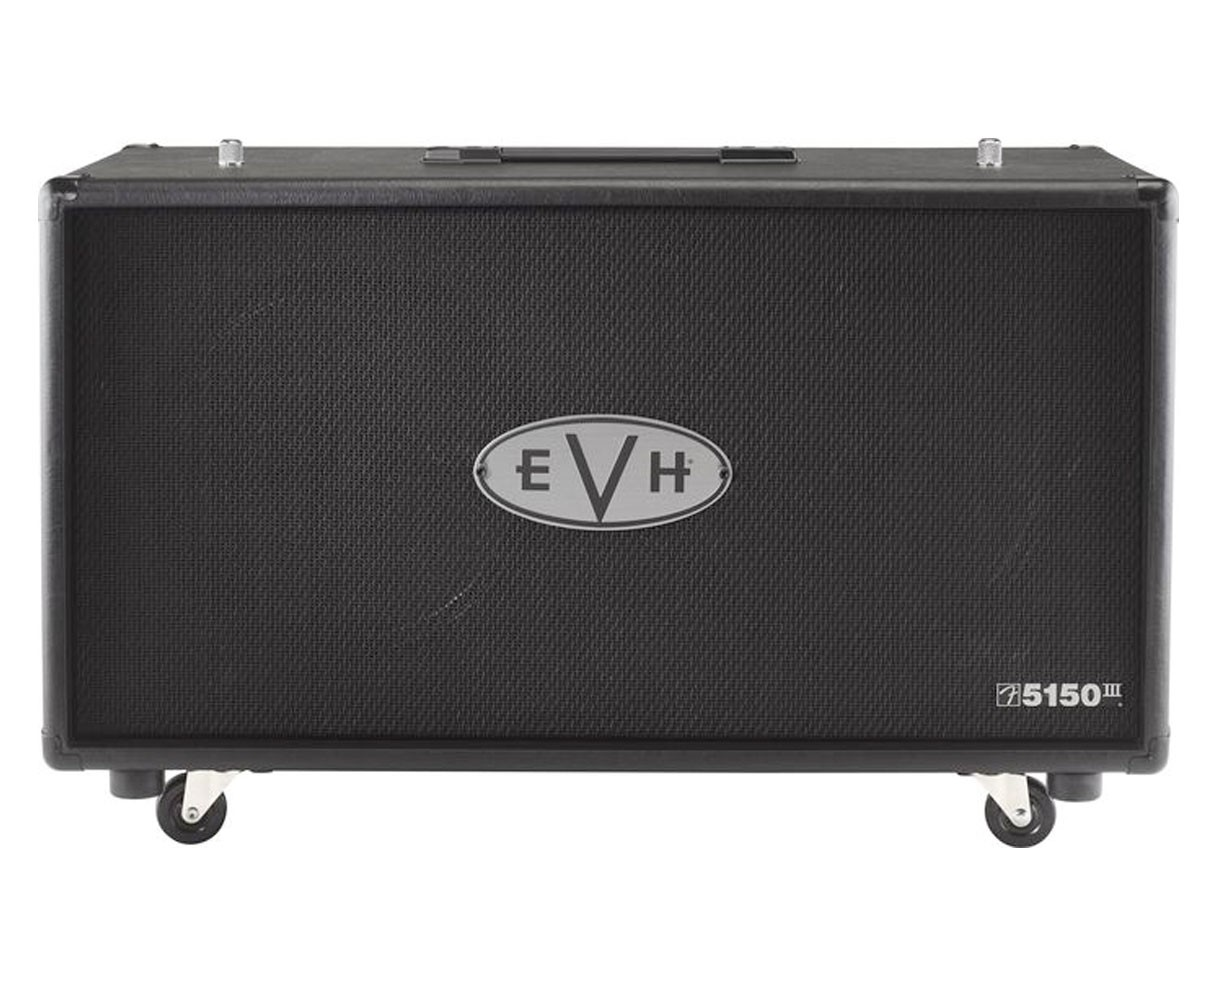 EVH 5150 III 212ST Cabinet - Black